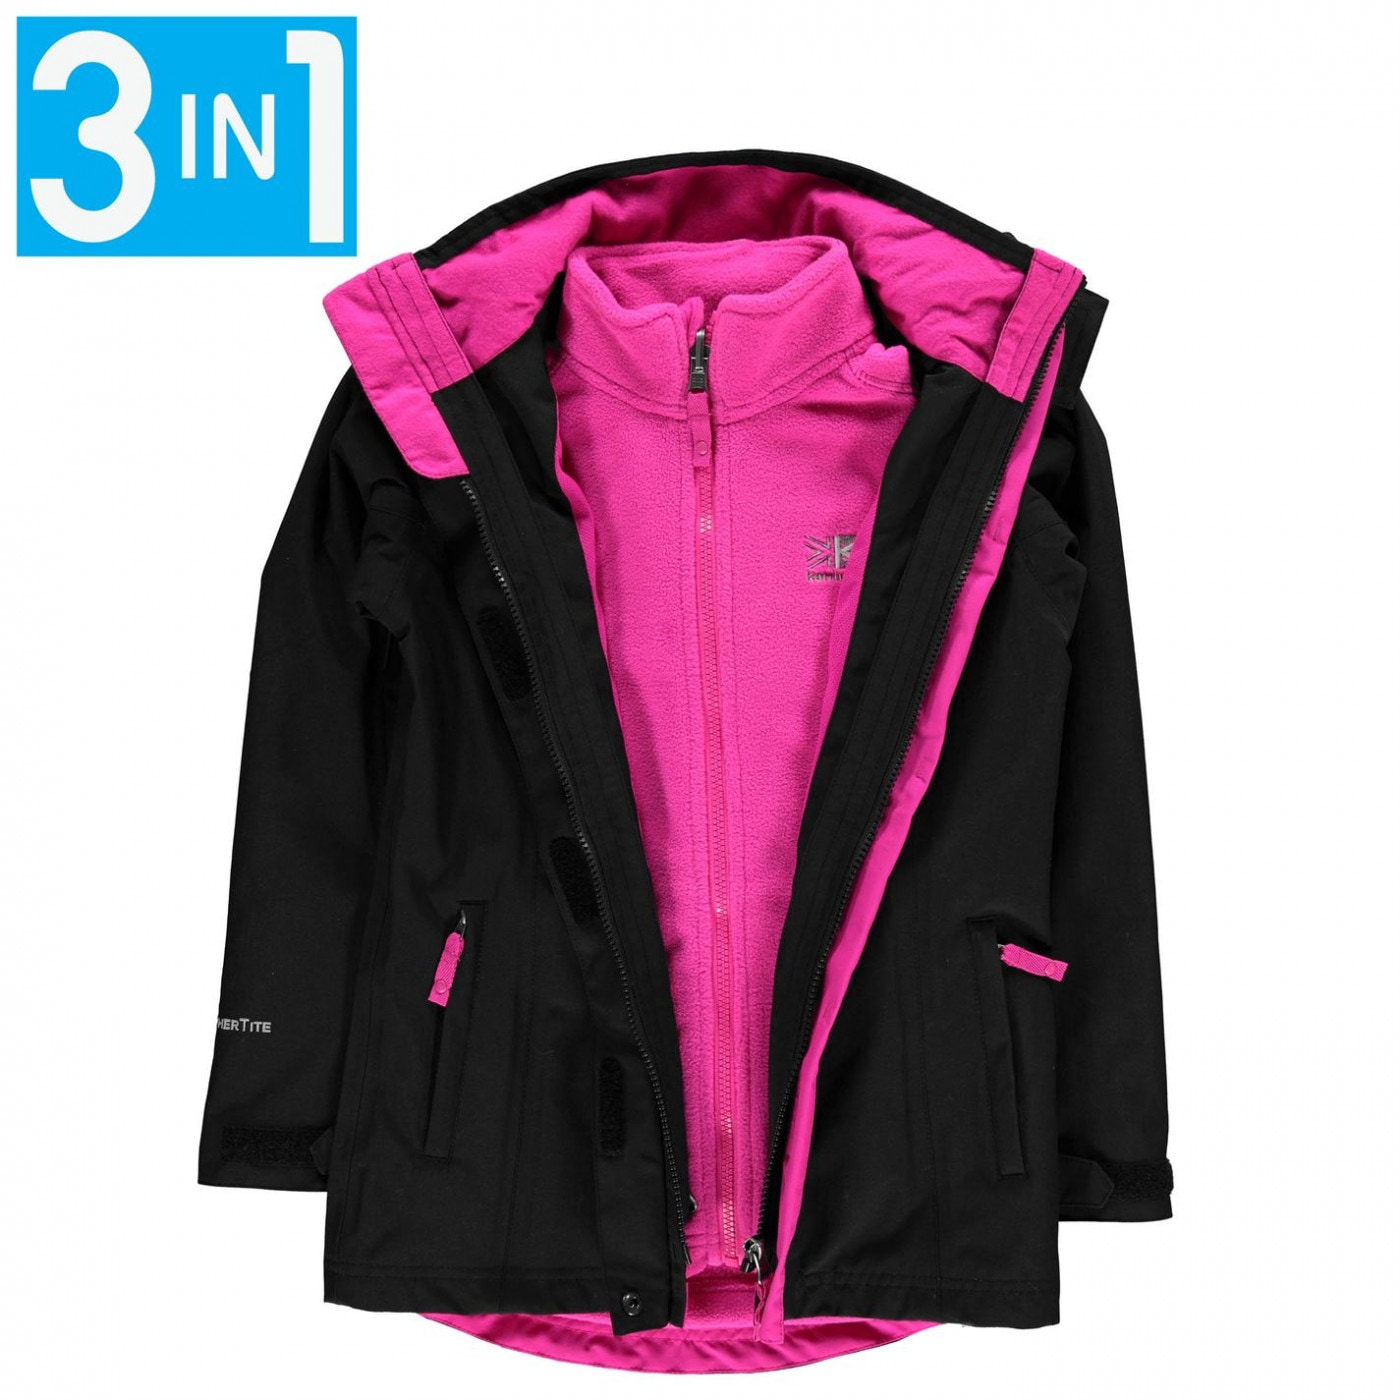 Karrimor Charcoal 3in1 Jacket Junior